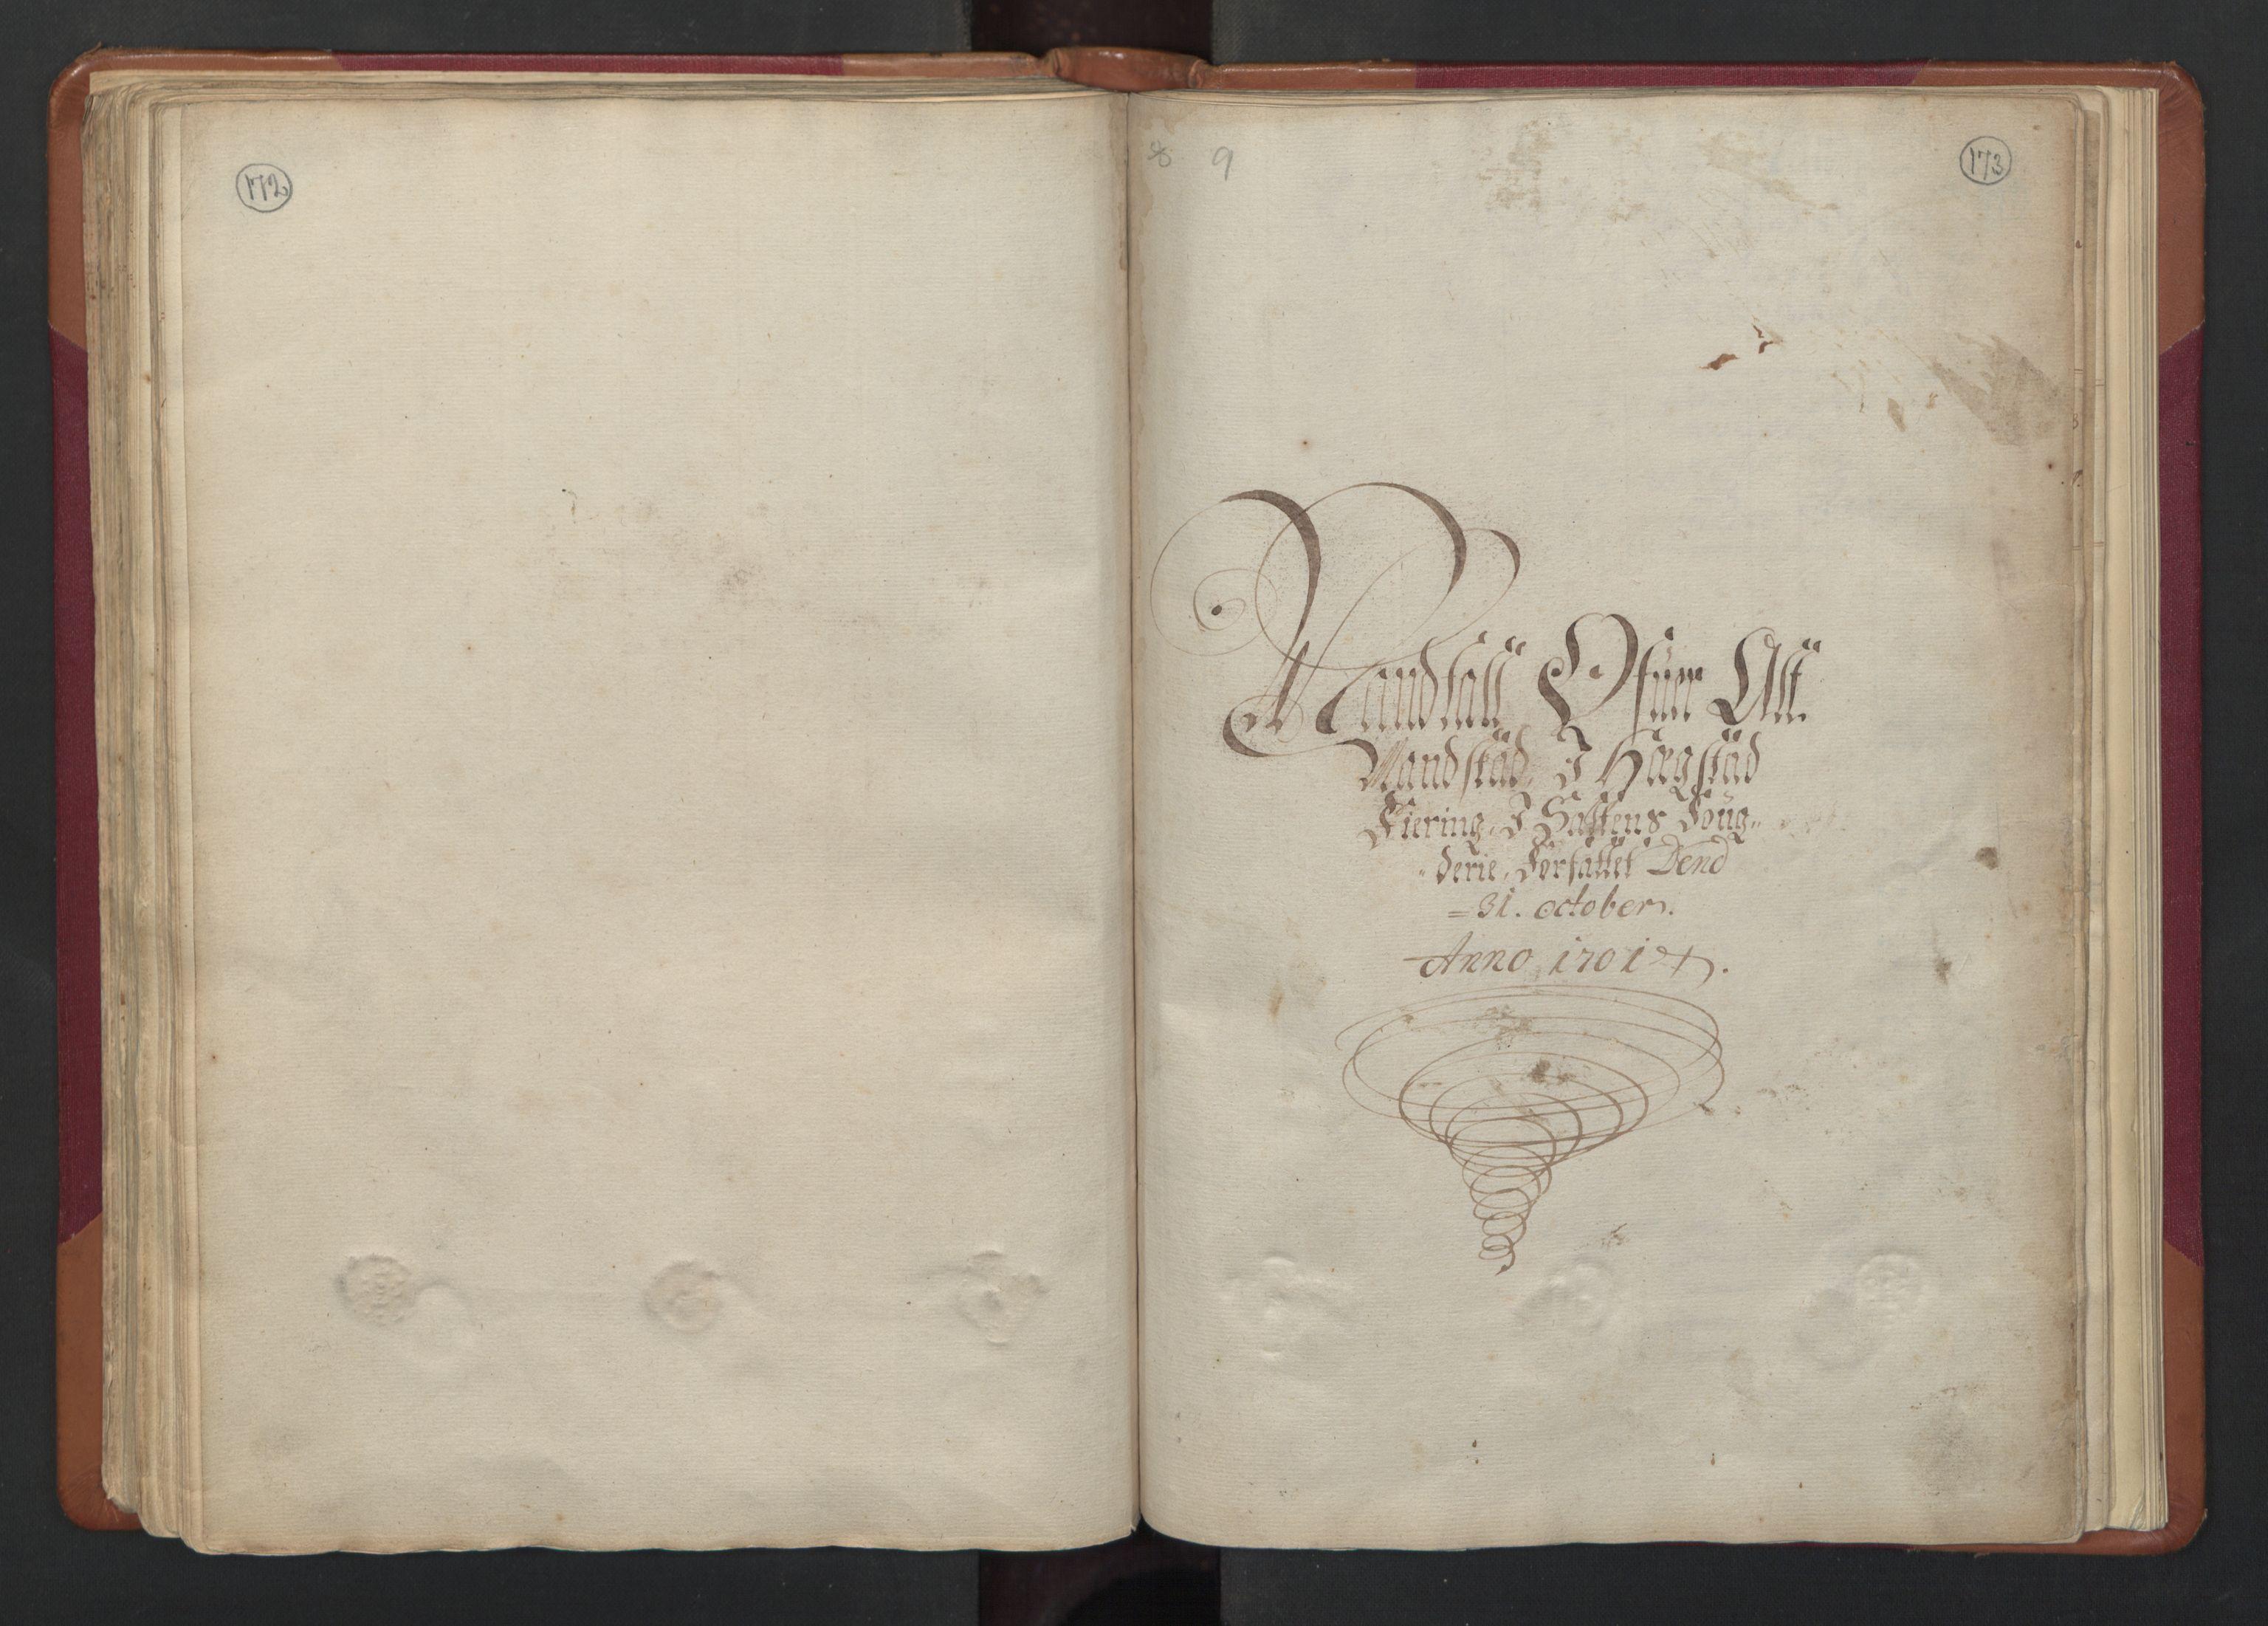 RA, Manntallet 1701, nr. 17: Salten fogderi, 1701, s. 172-173